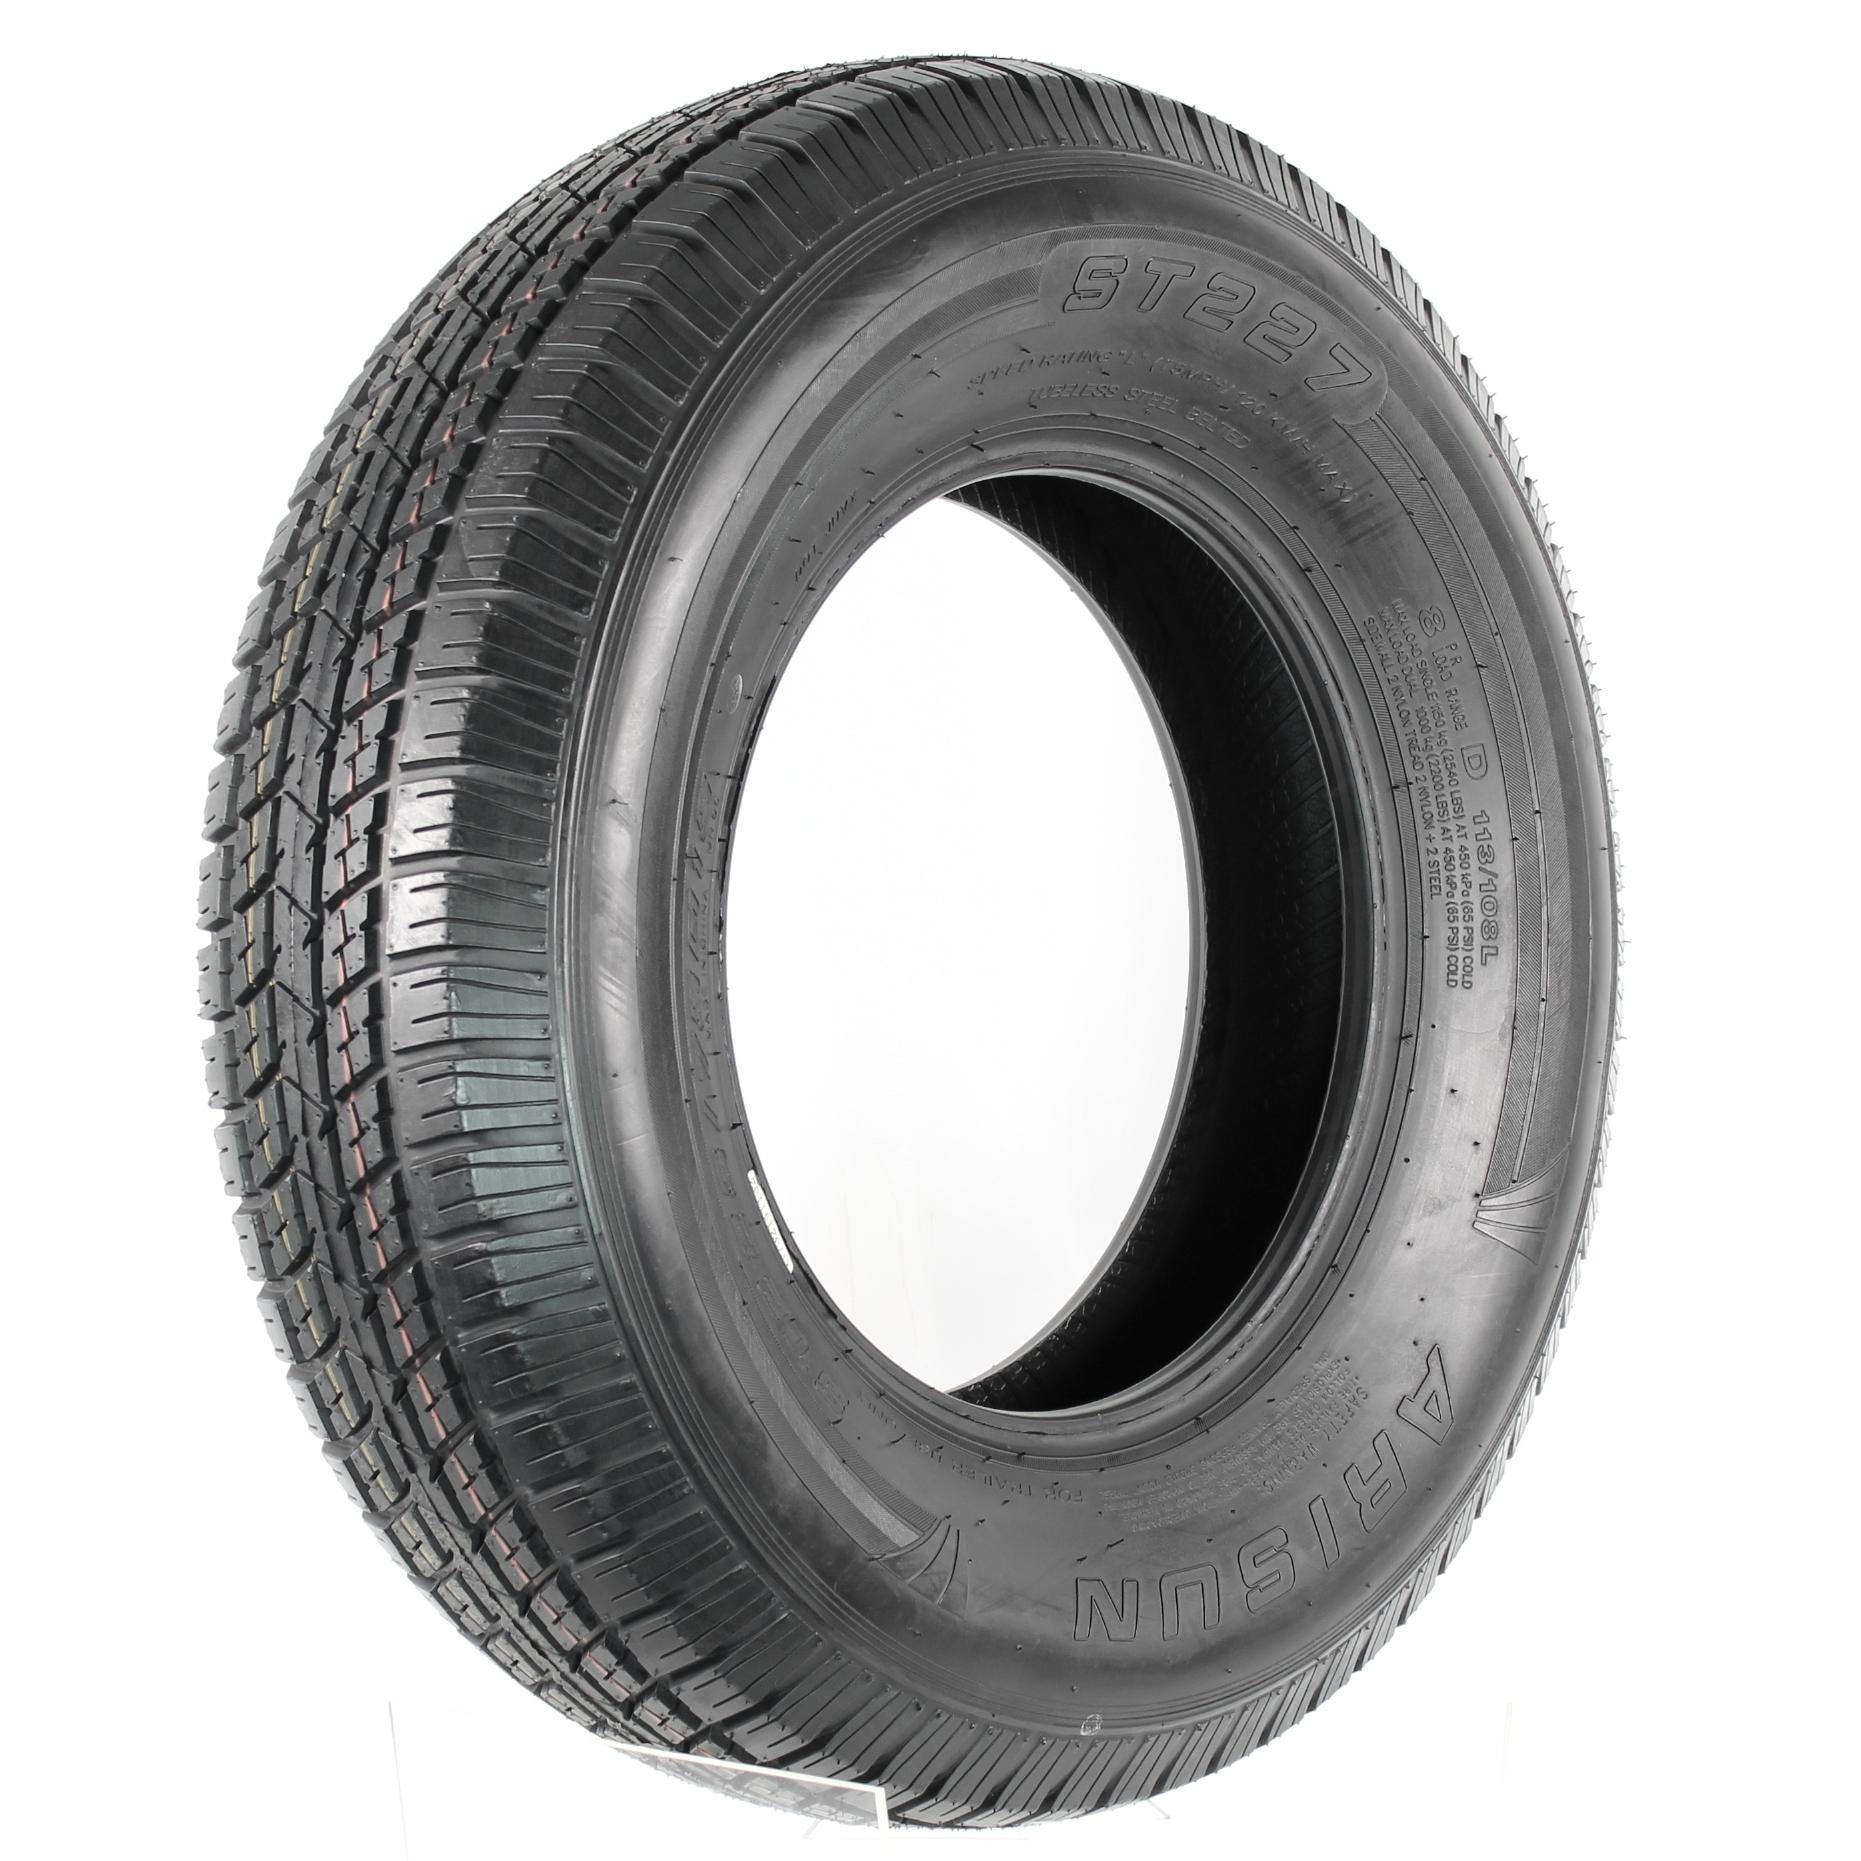 Arisun ST205/75D14 LRC Bias Tire  Image